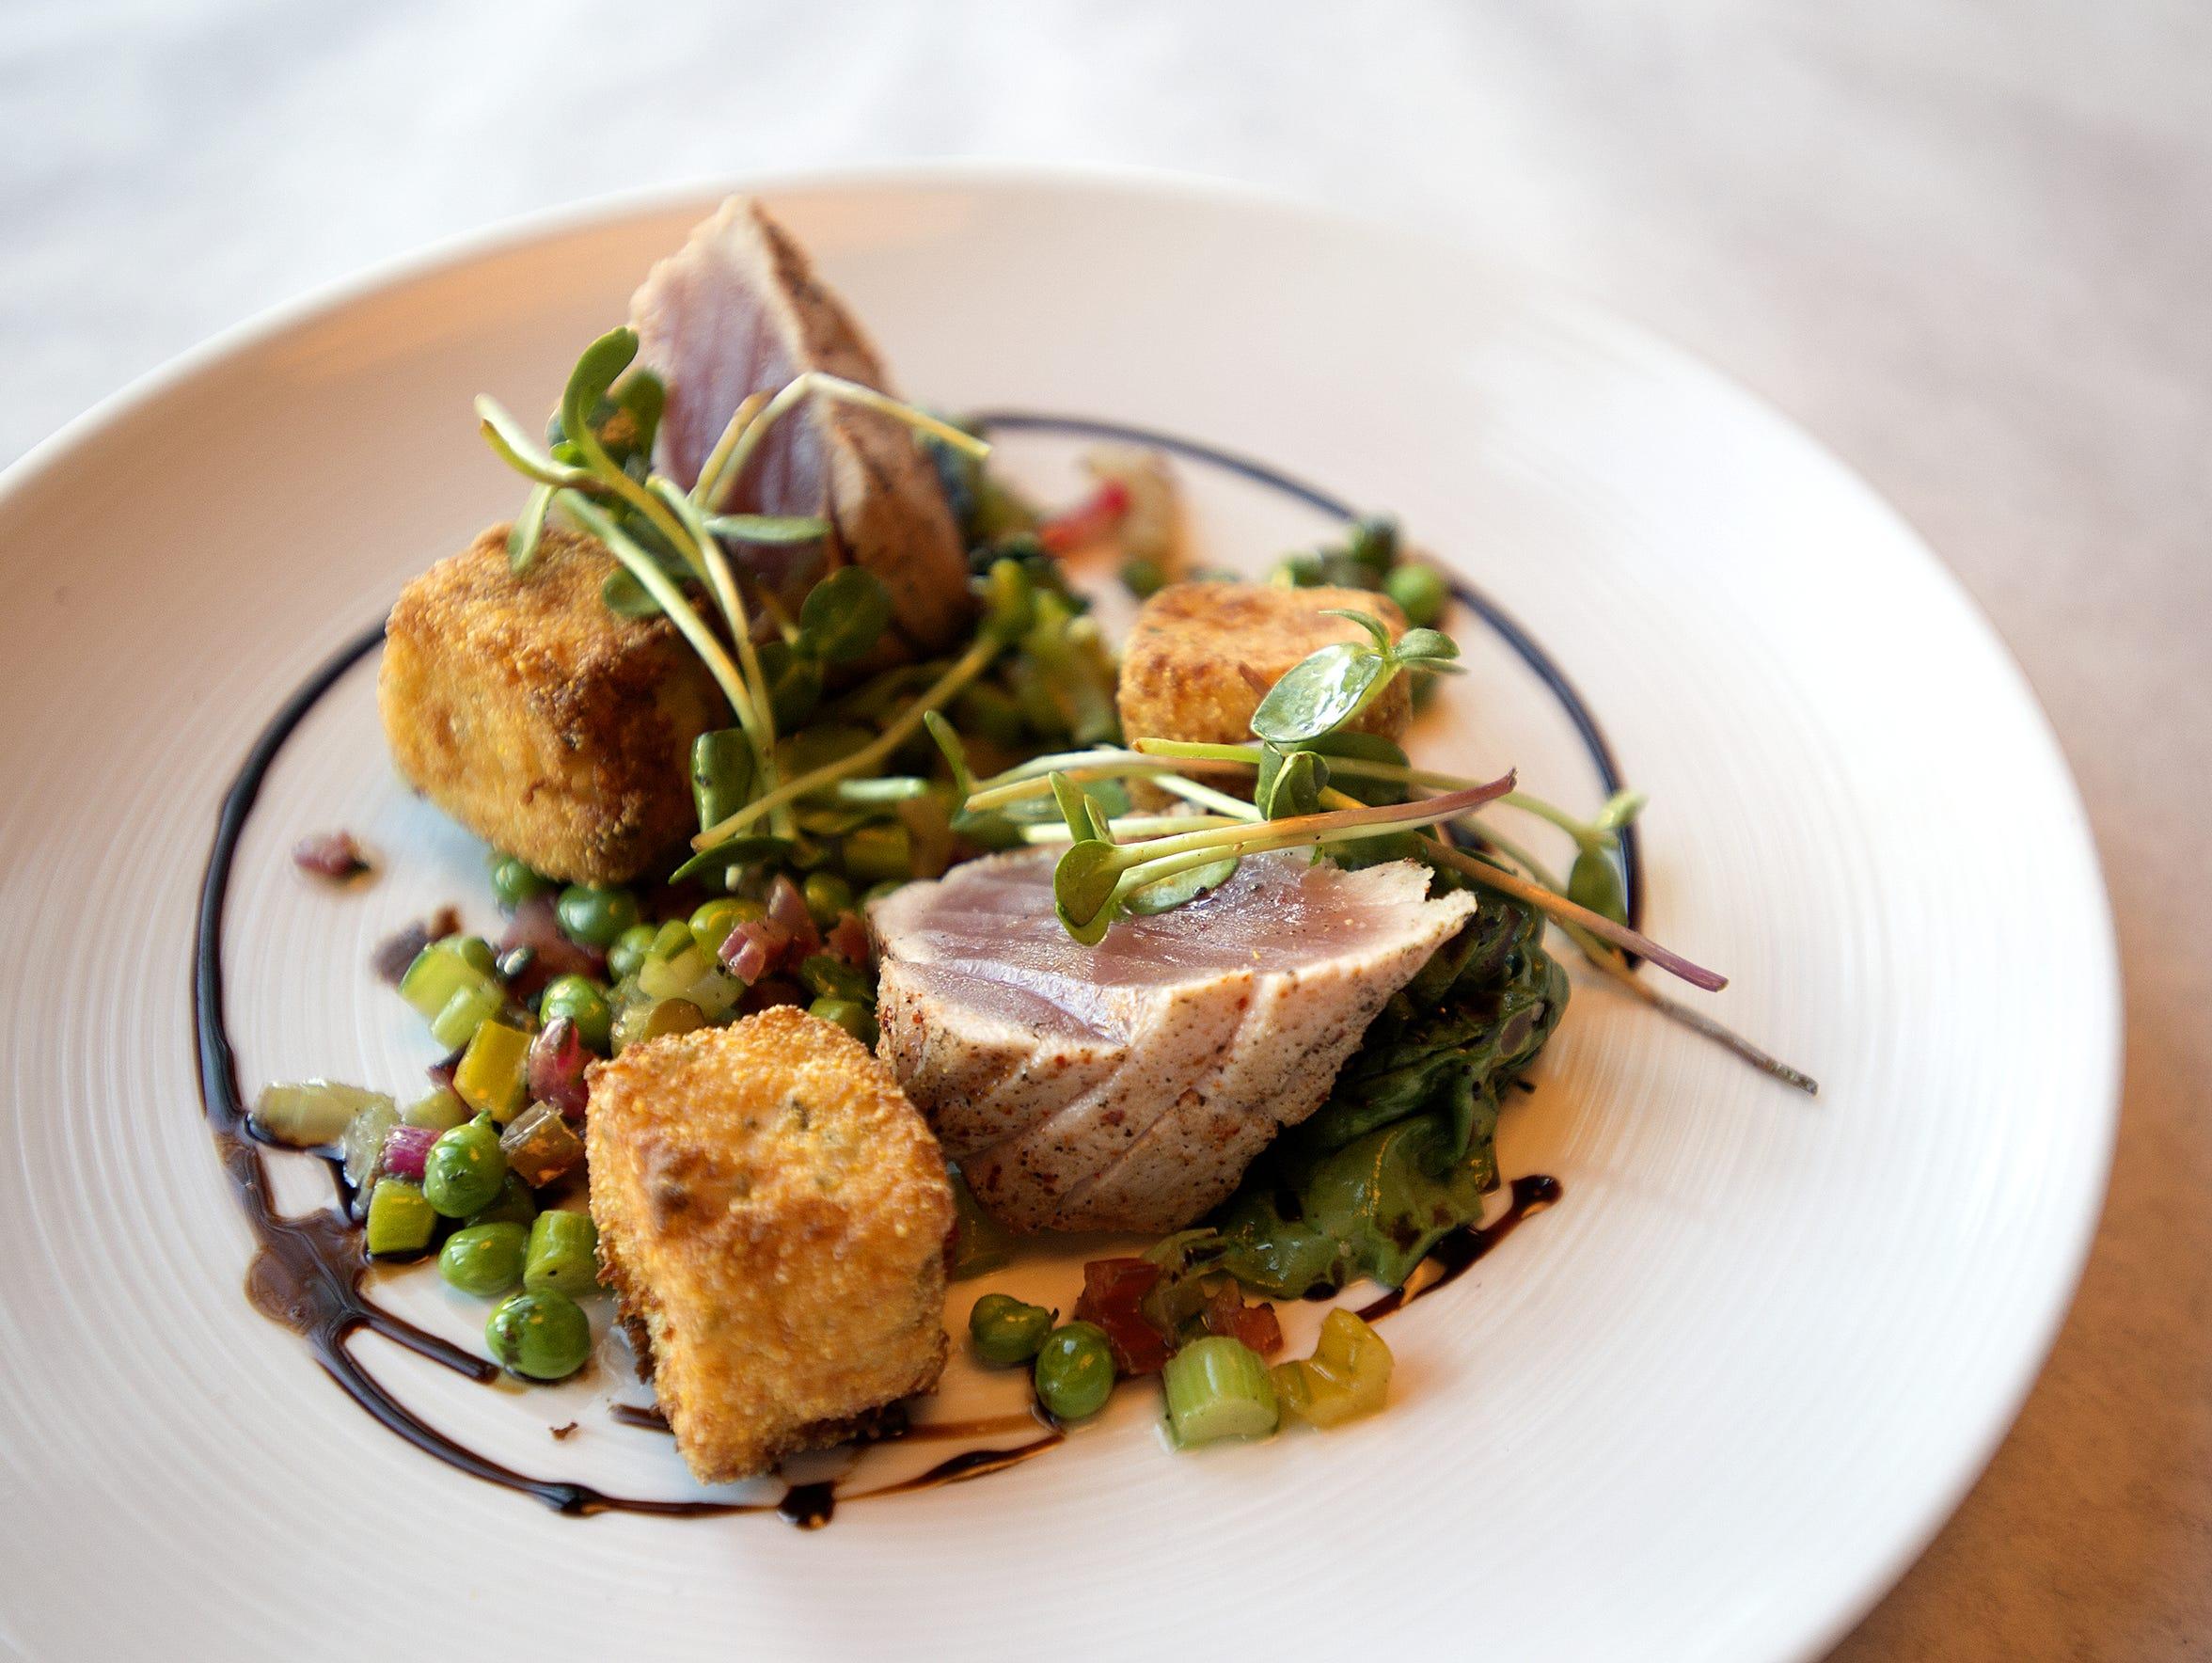 Seared ahi tuna served rare with a mix of peas, asparagus